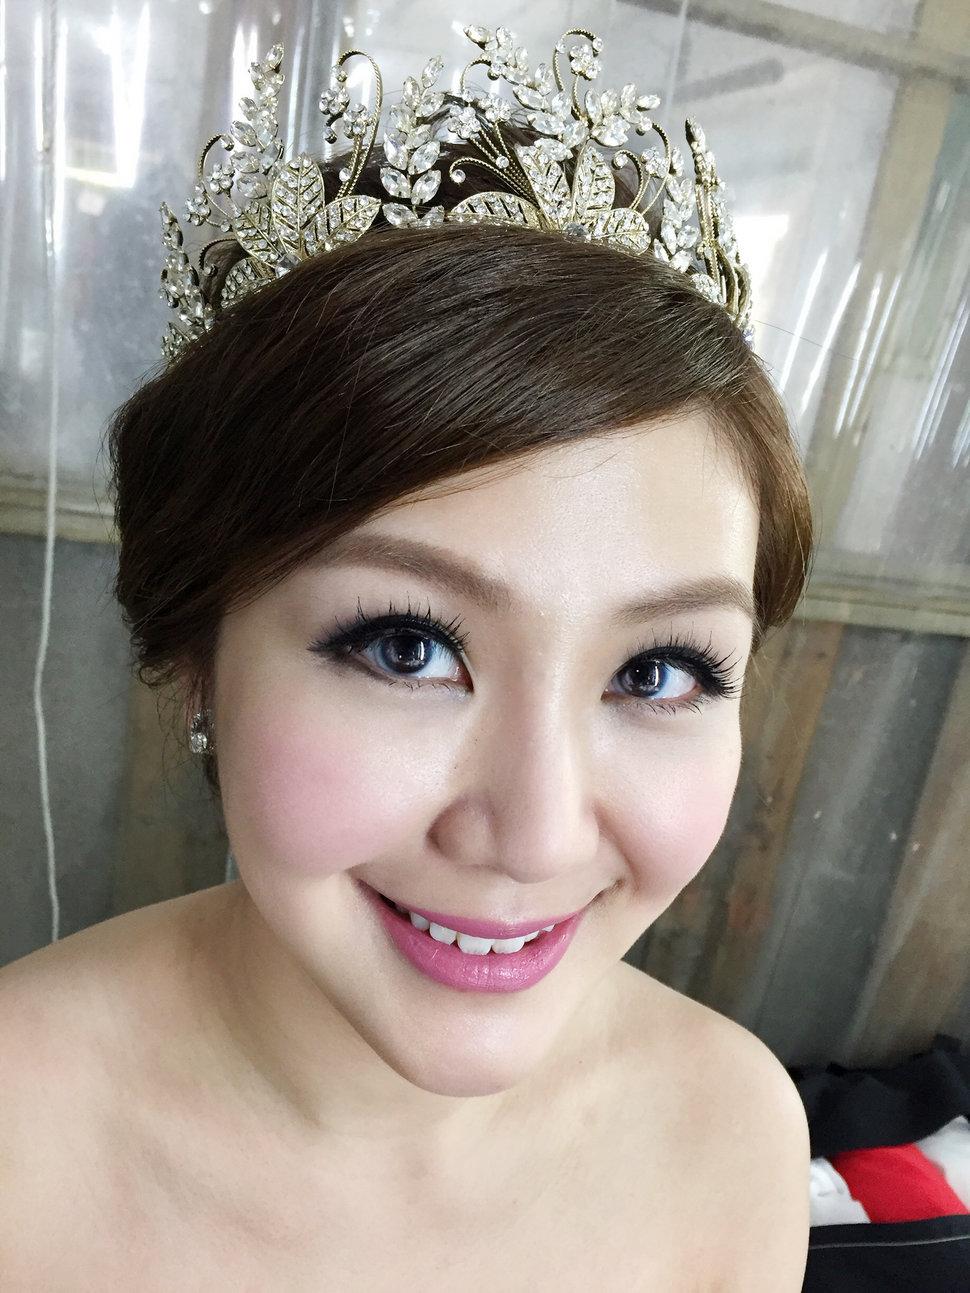 IMG_8966 - Jojo chen Makeup新娘秘書《結婚吧》